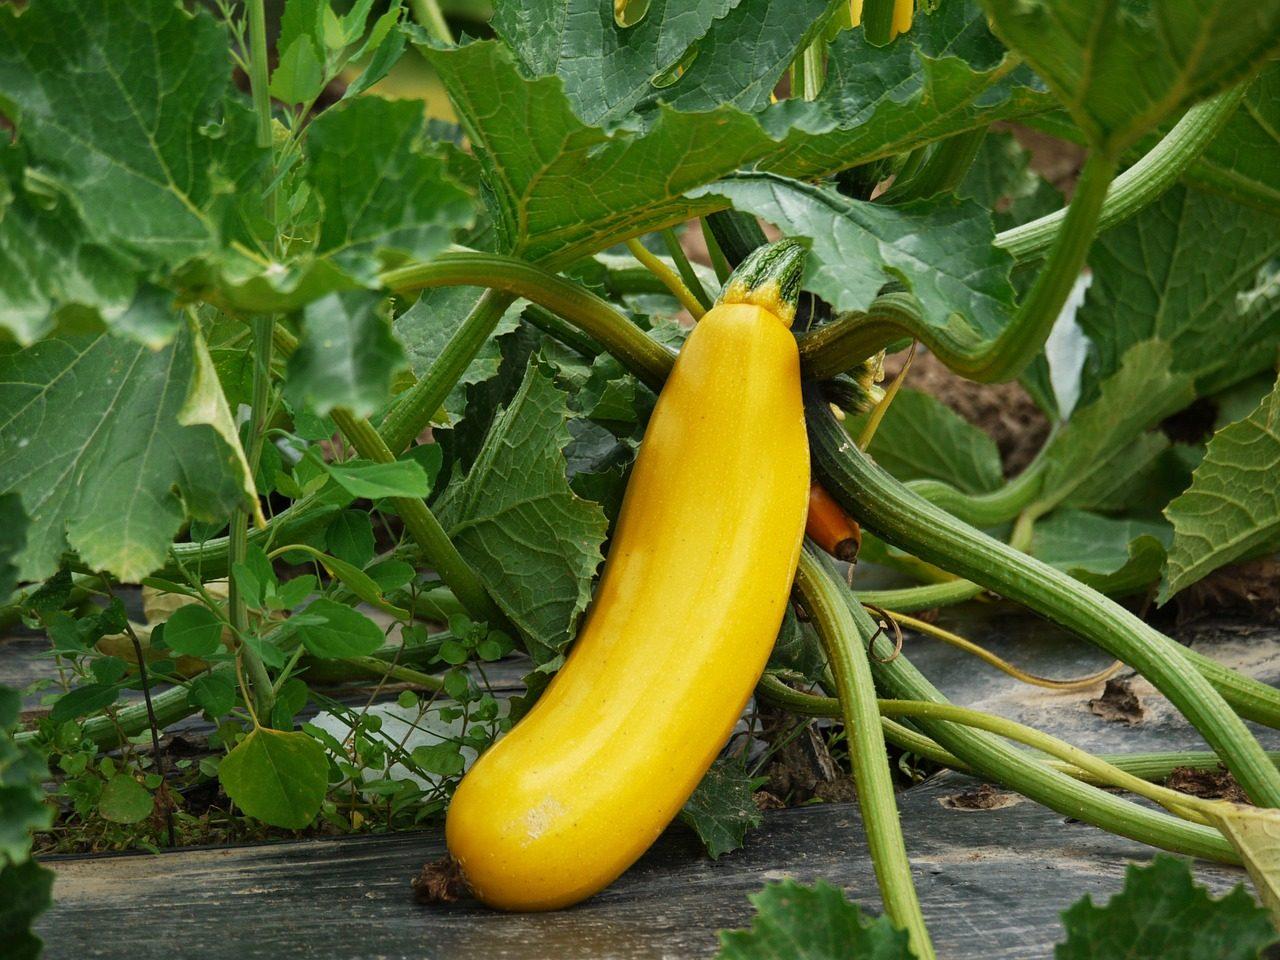 zucchini-1522535_1280-1-1280x960.jpg